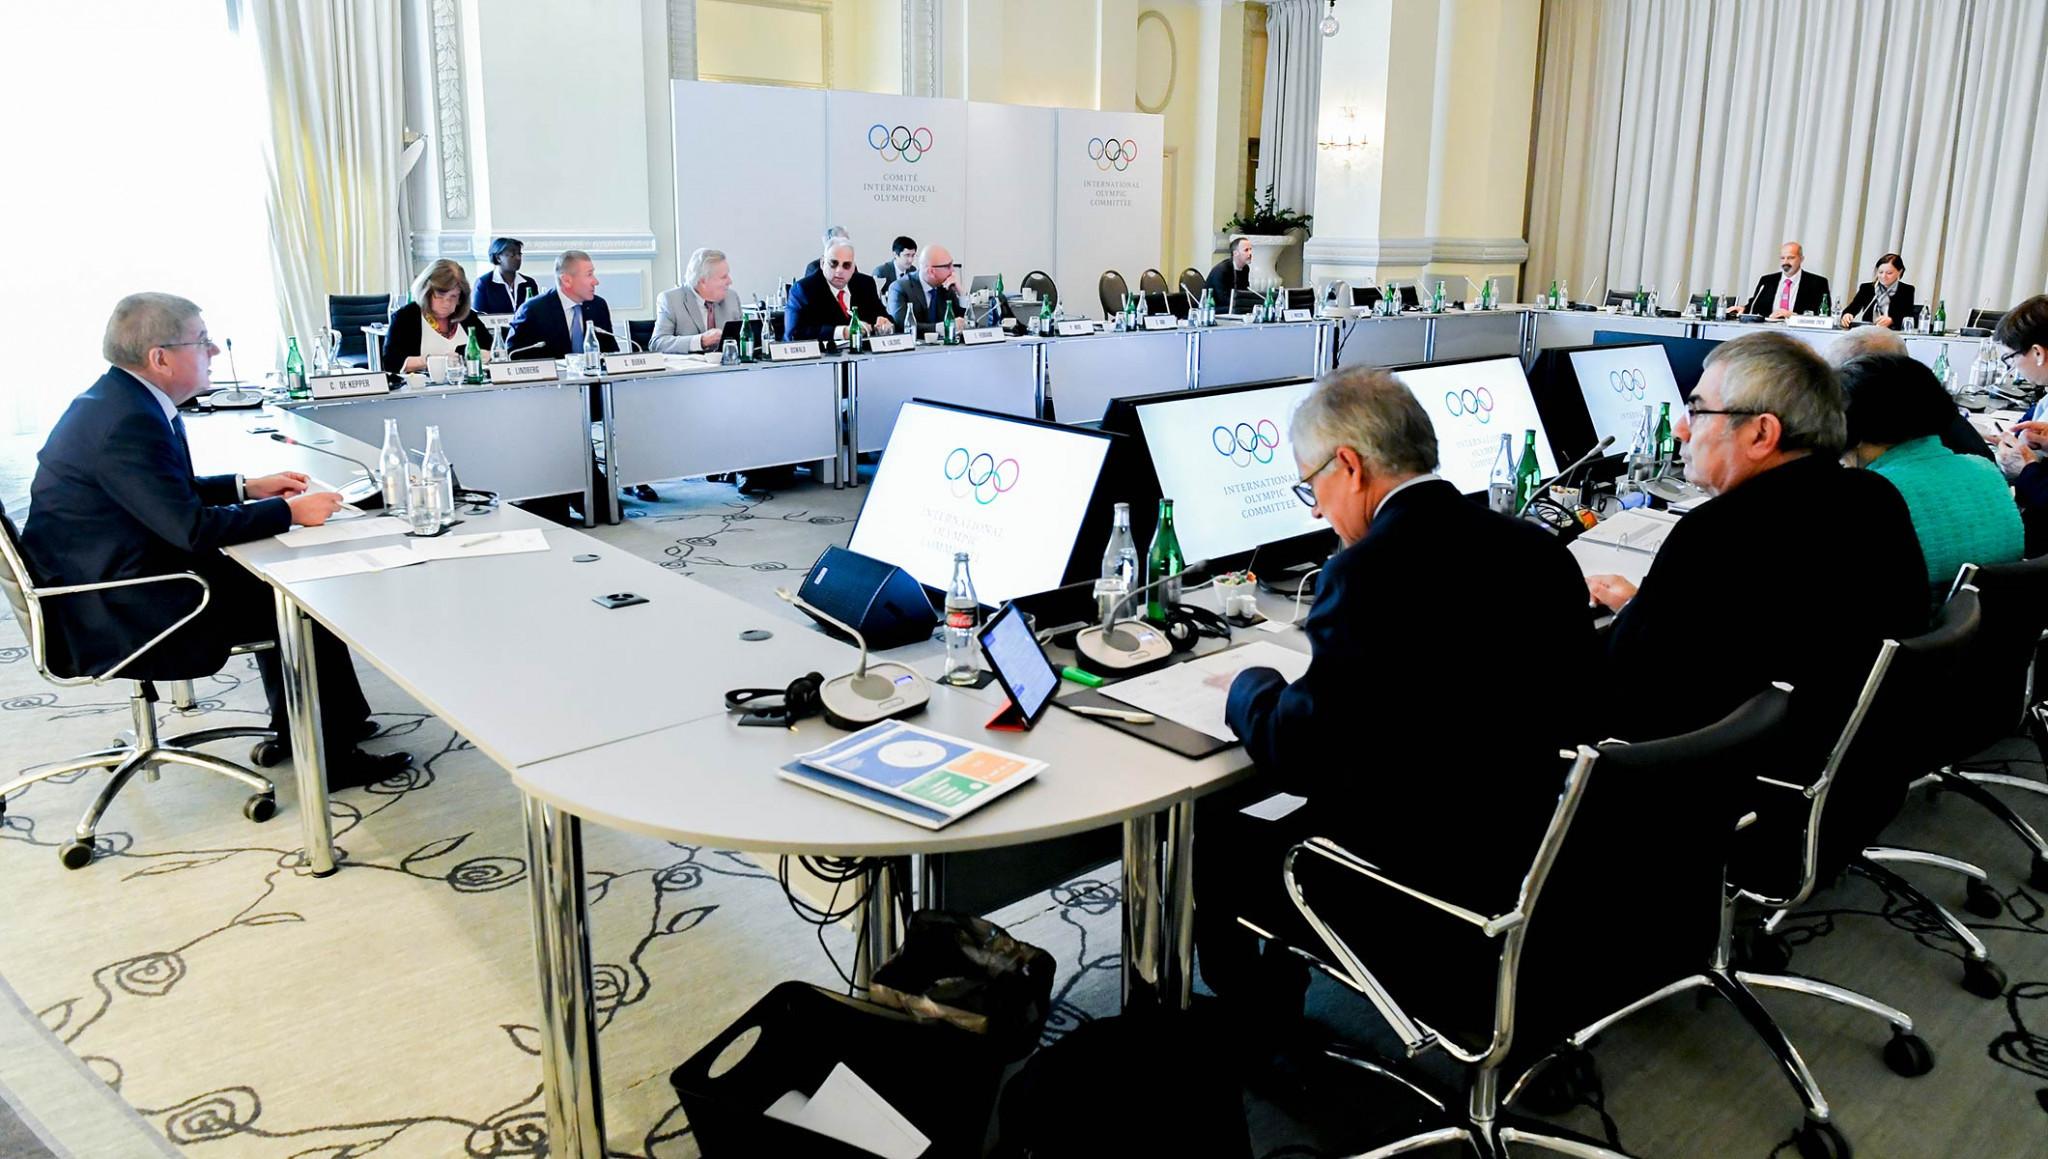 IOC to distribute $430 million to International Federations and NOCs following Pyeongchang 2018